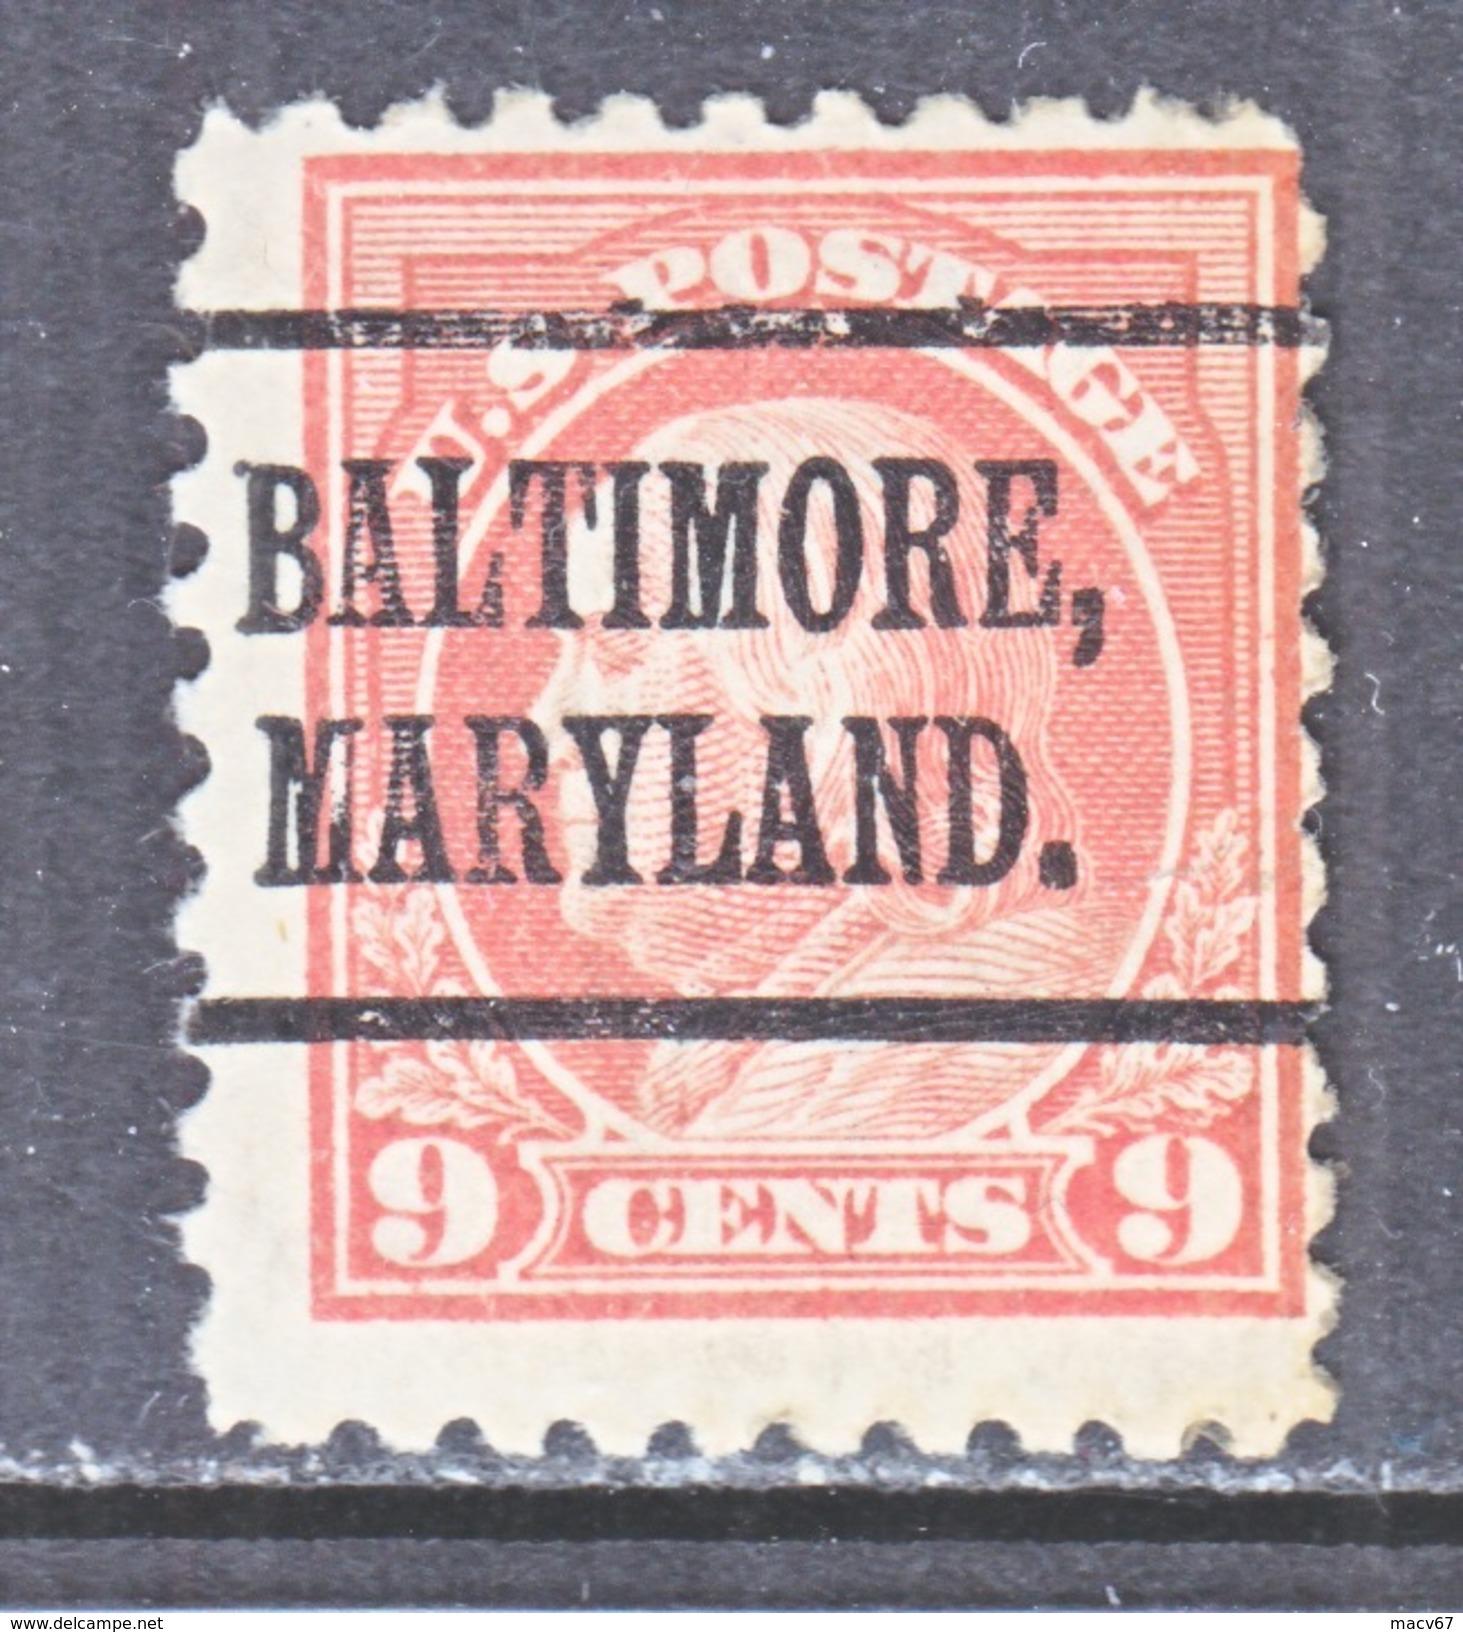 U.S. 471    Perf.. 10  No Wmk.  *  MARYLAND  1916-7 Issue   MINT - United States